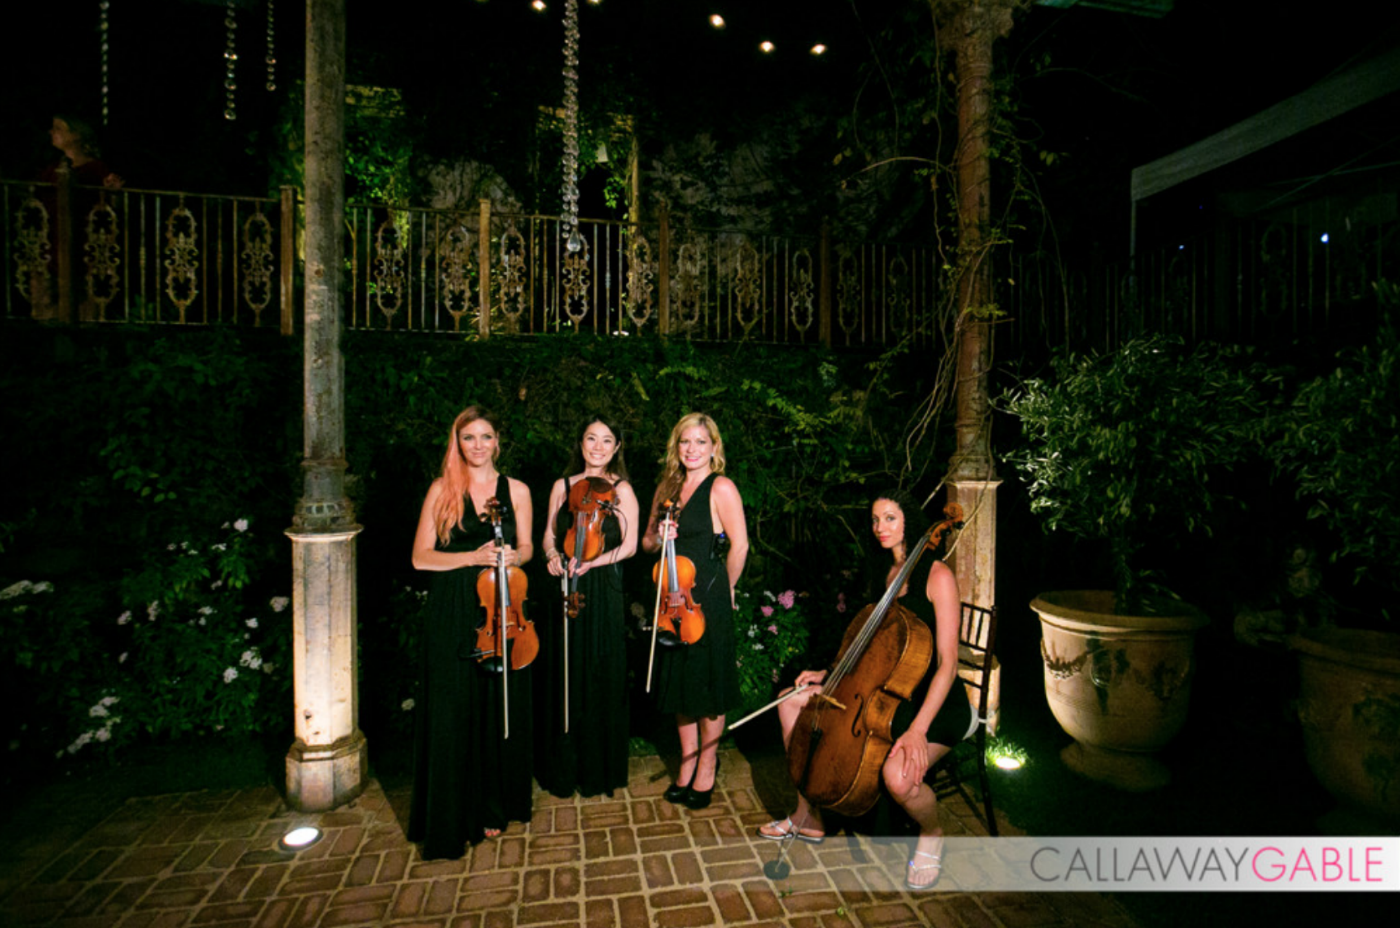 los-angeles-wedding-music-ceremony-first-dance-string-quartet-violin-viola-cello-orange-county-maui-1.png